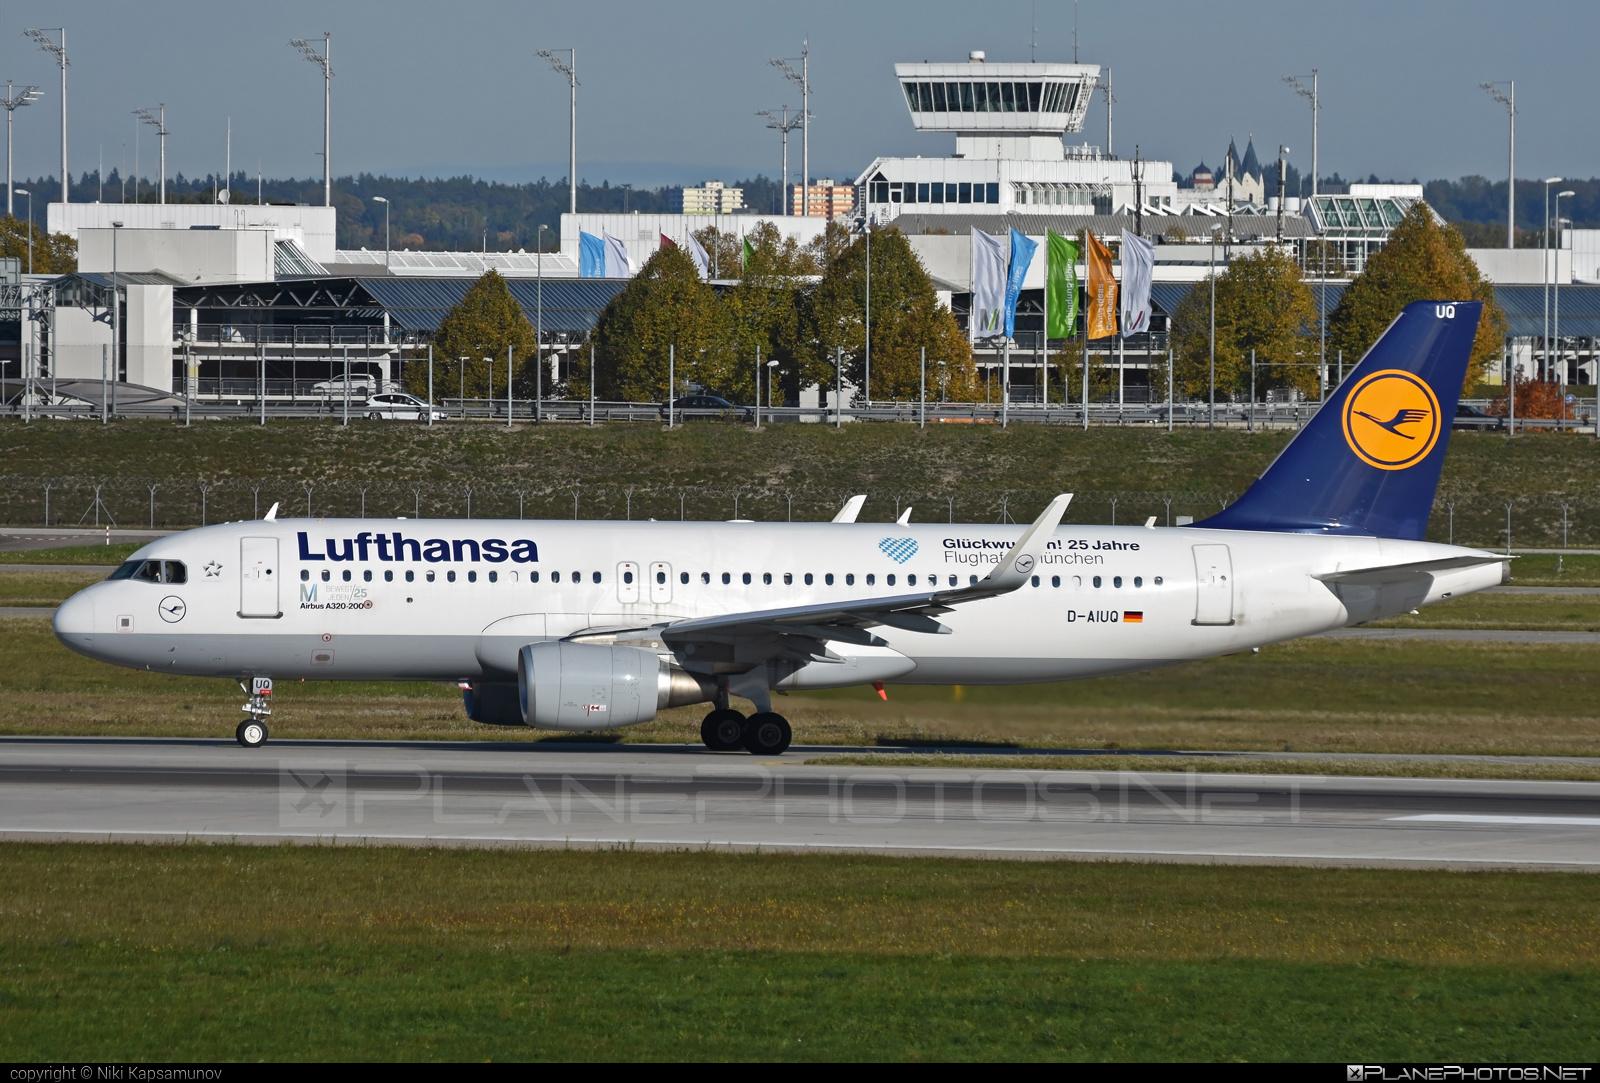 Airbus A320-214 - D-AIUQ operated by Lufthansa #a320 #a320family #airbus #airbus320 #lufthansa